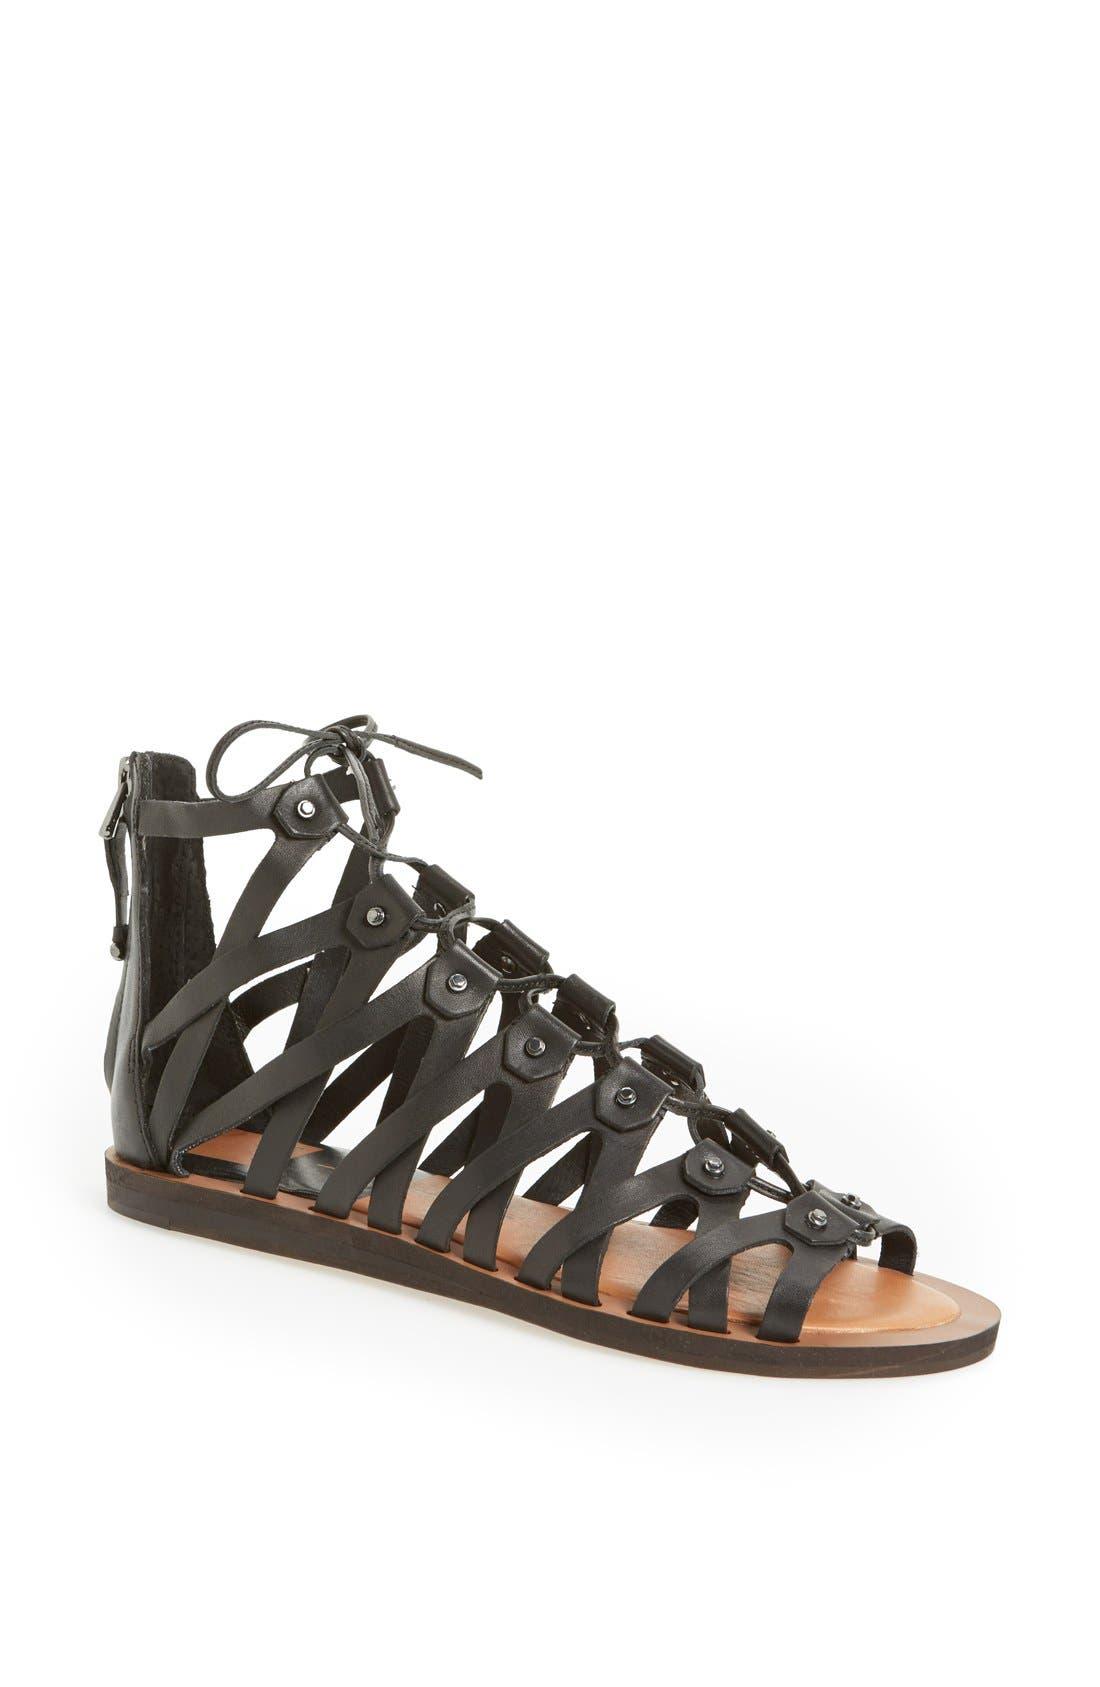 Main Image - Dolce Vita 'Fray' Sandal